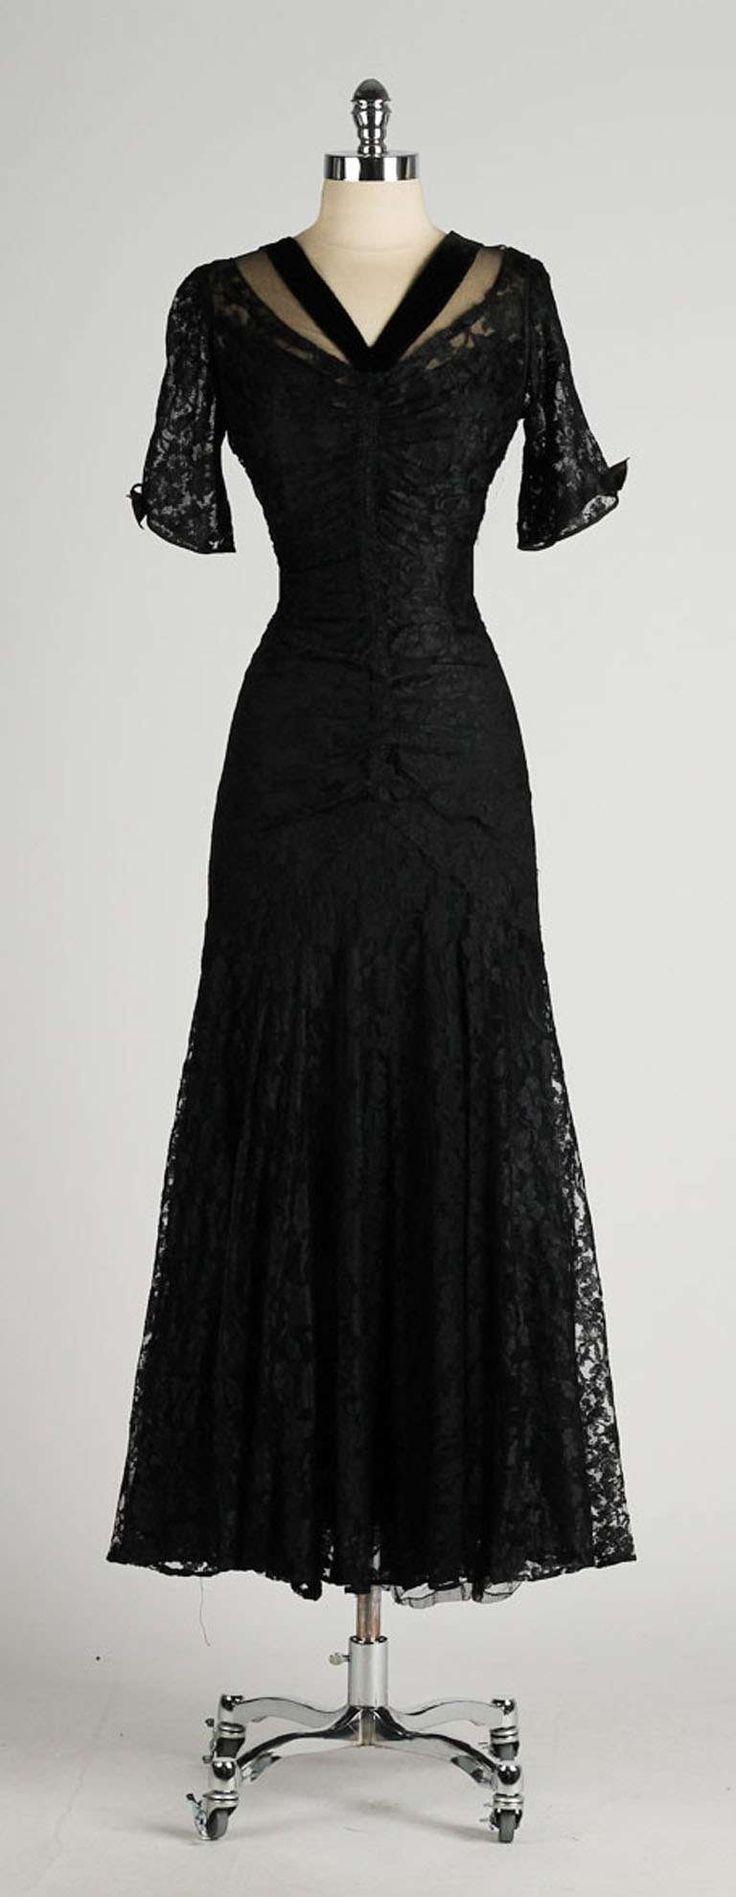 1940's Black Chantilly Lace Illusion Bodice Dress